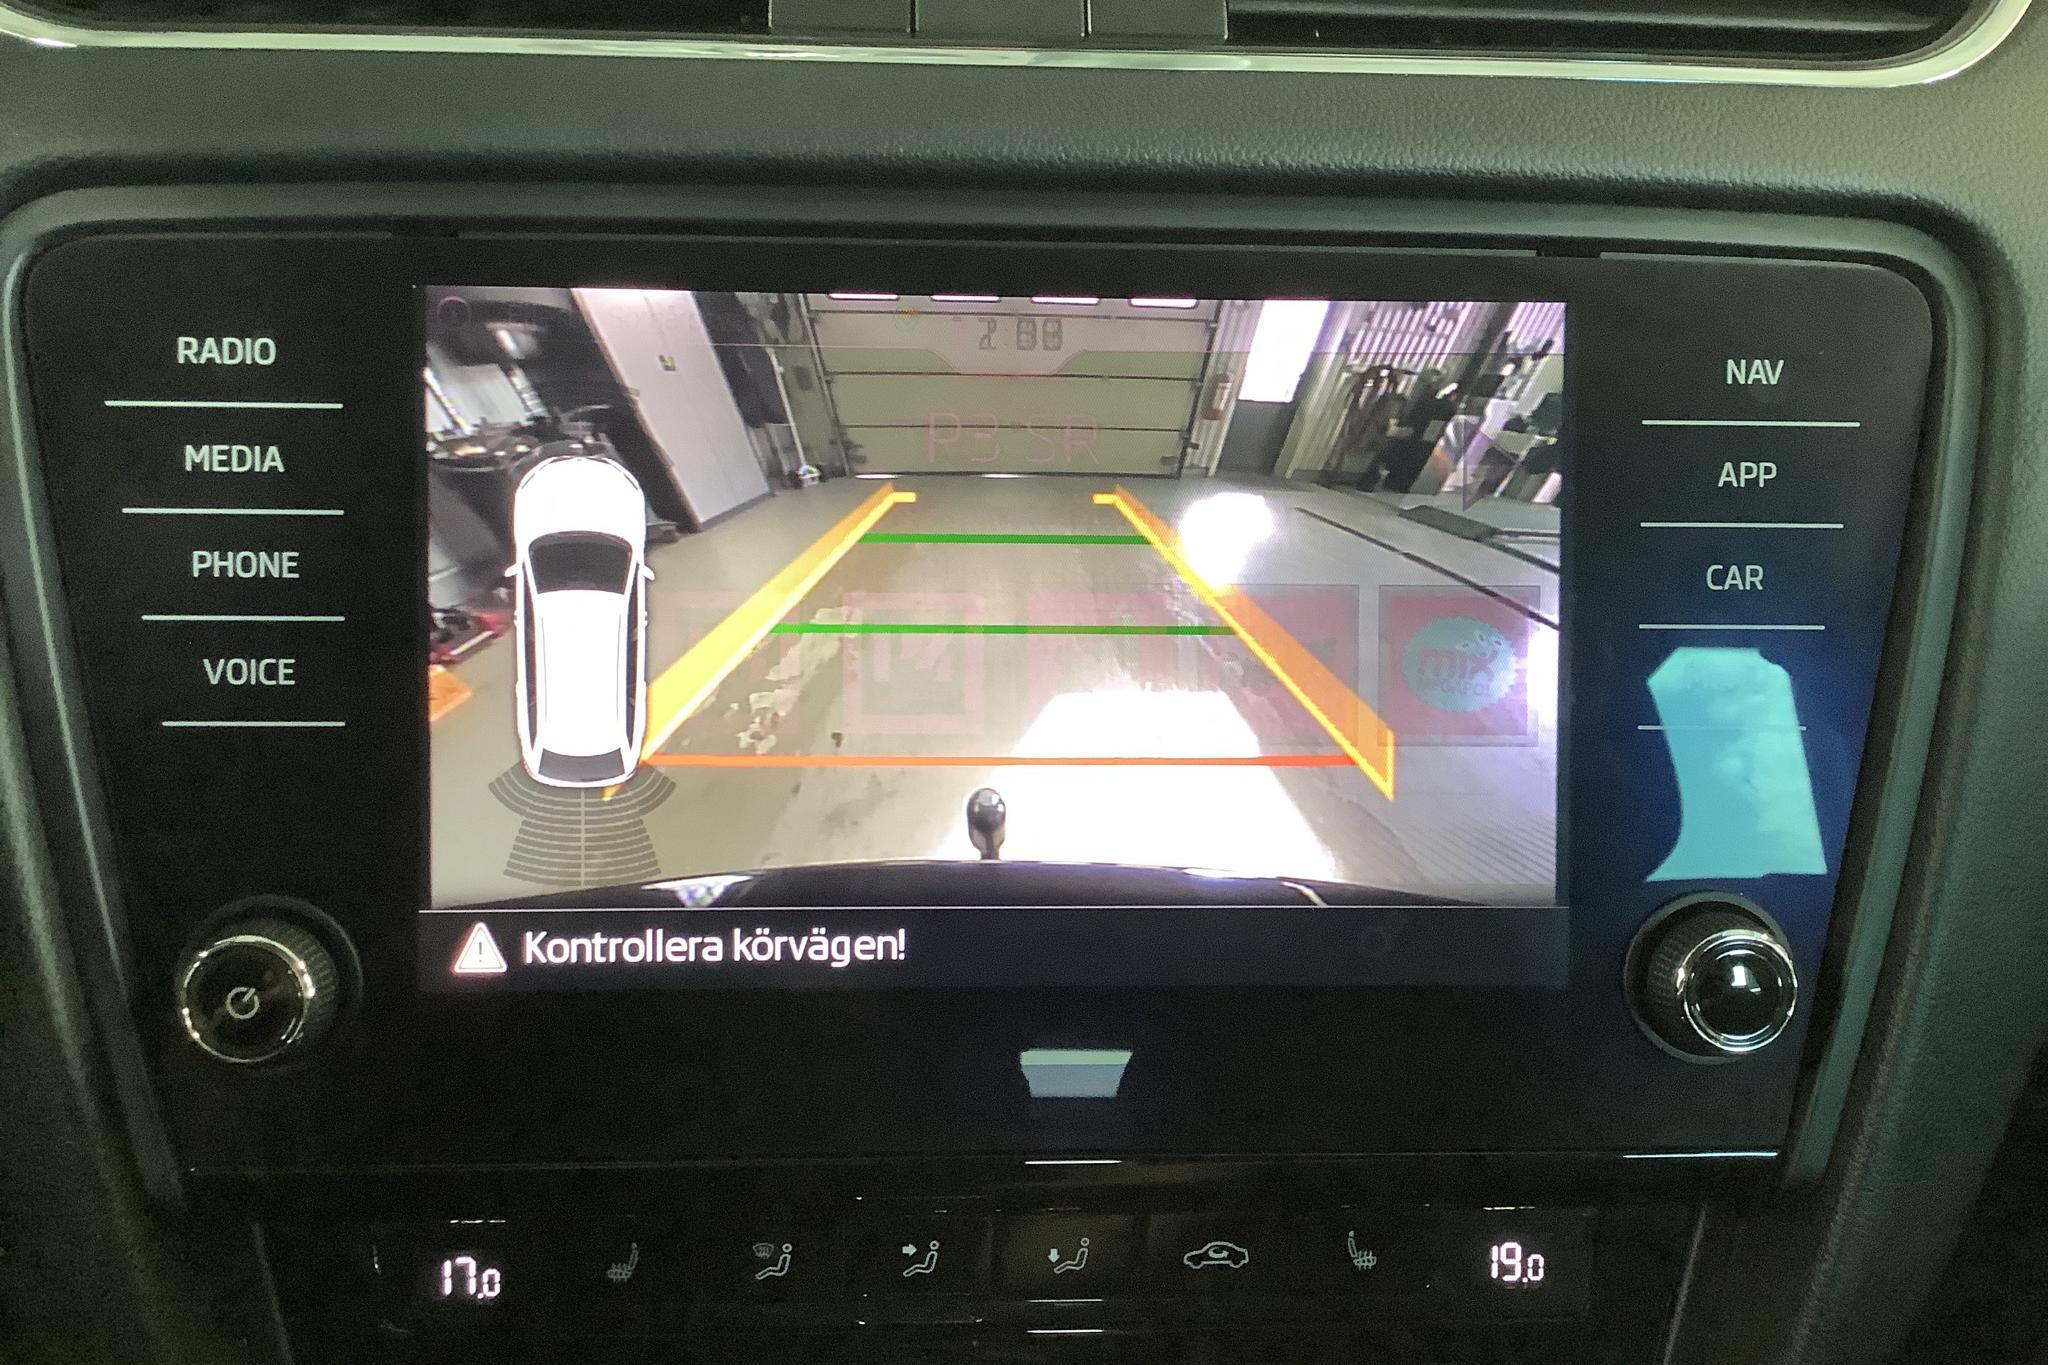 Skoda Octavia III 2.0 TDI Combi 4x4 (150hk) - 154 160 km - Automatic - black - 2018